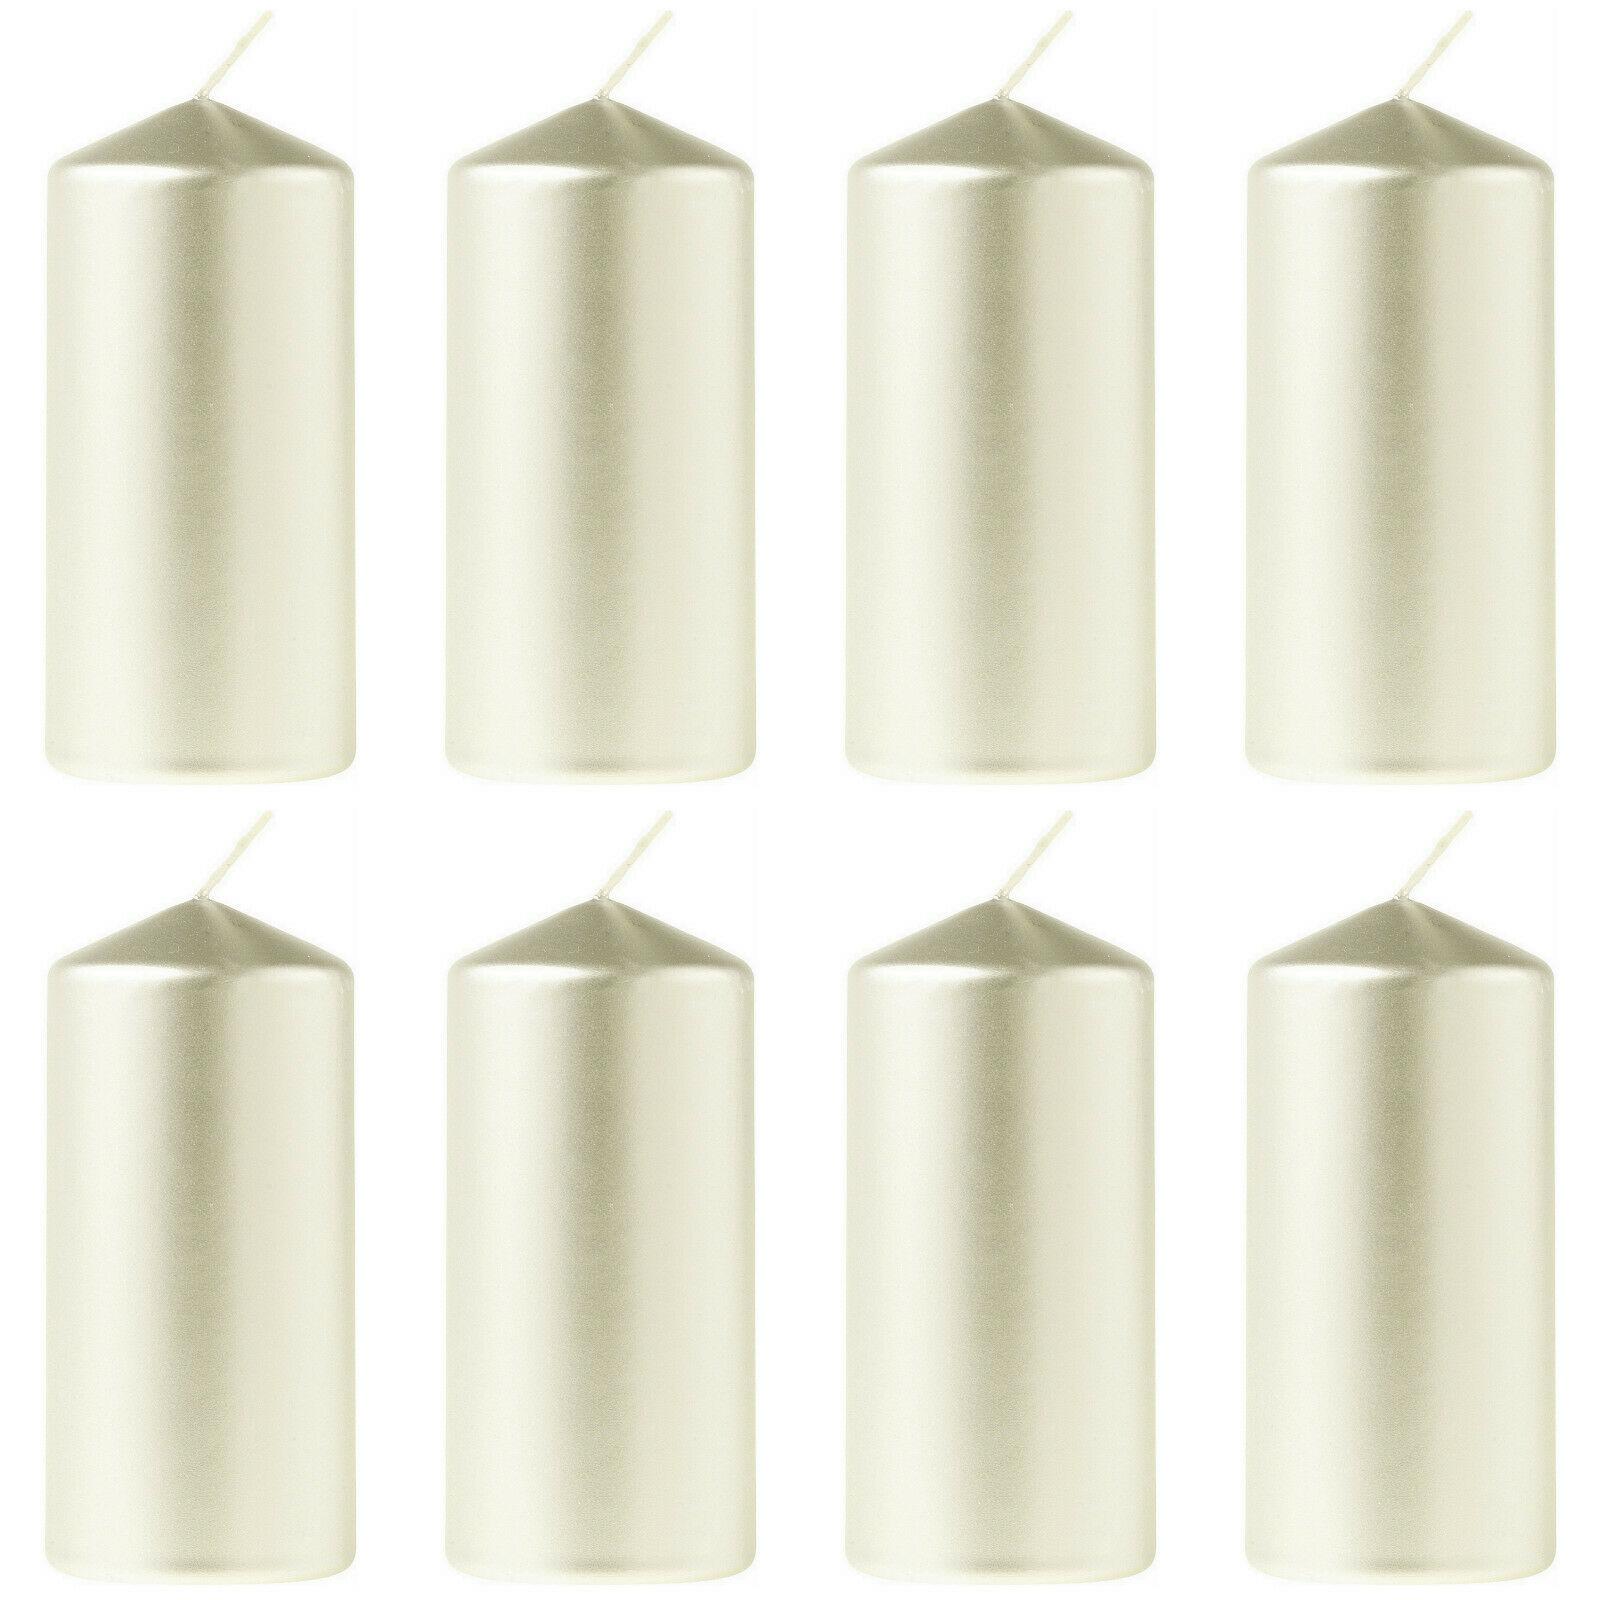 12 Stück Eika Stumpenkerzen Metallic 110 x 60 mm Stumpen Kerze Weihnachten  - Metallic Perlmutt-Champagner